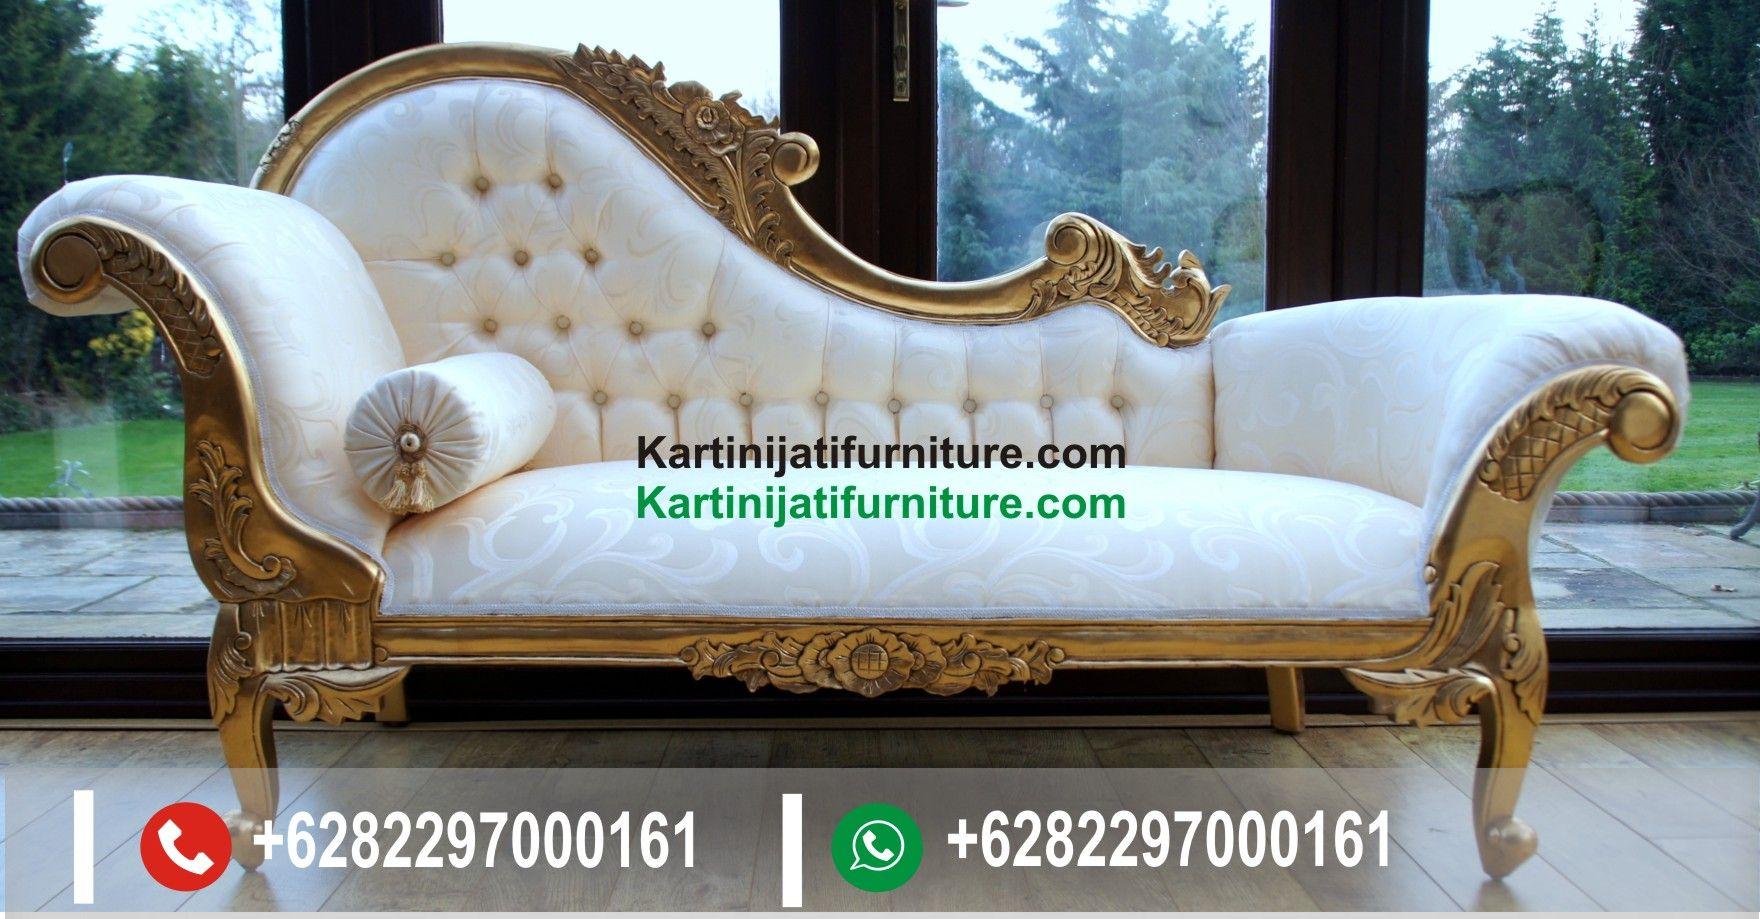 Cleopatra Sofa sofa cleopatra jati, ini merupakan produk yang sangat mewah sekali